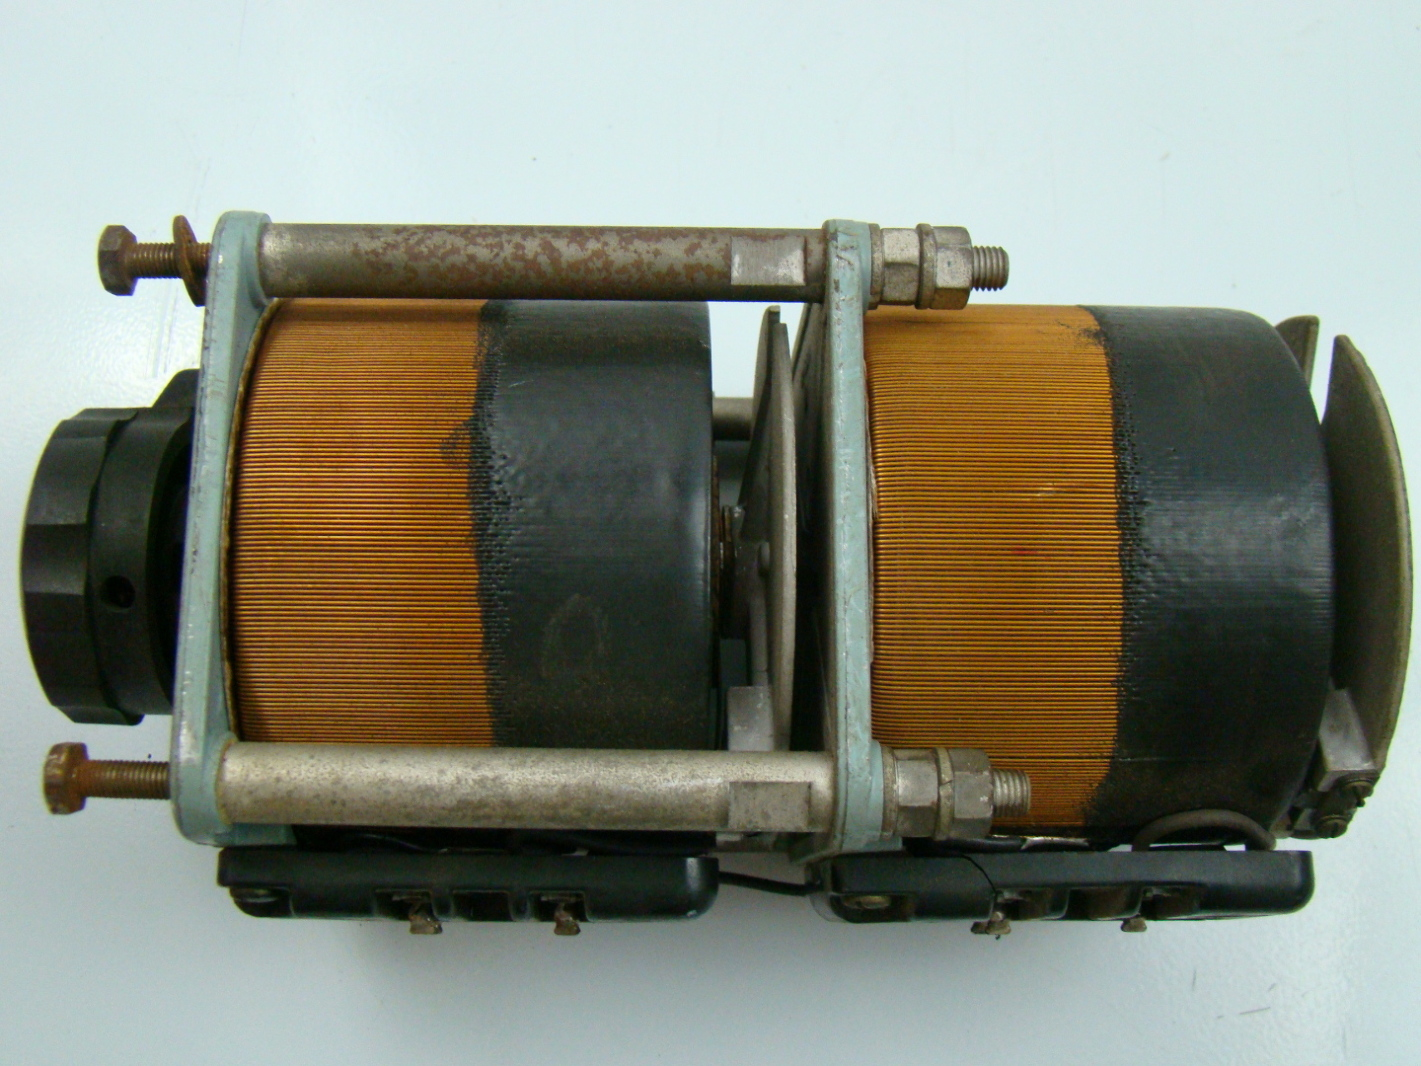 Powerstat 117CU Variable Autotransformer